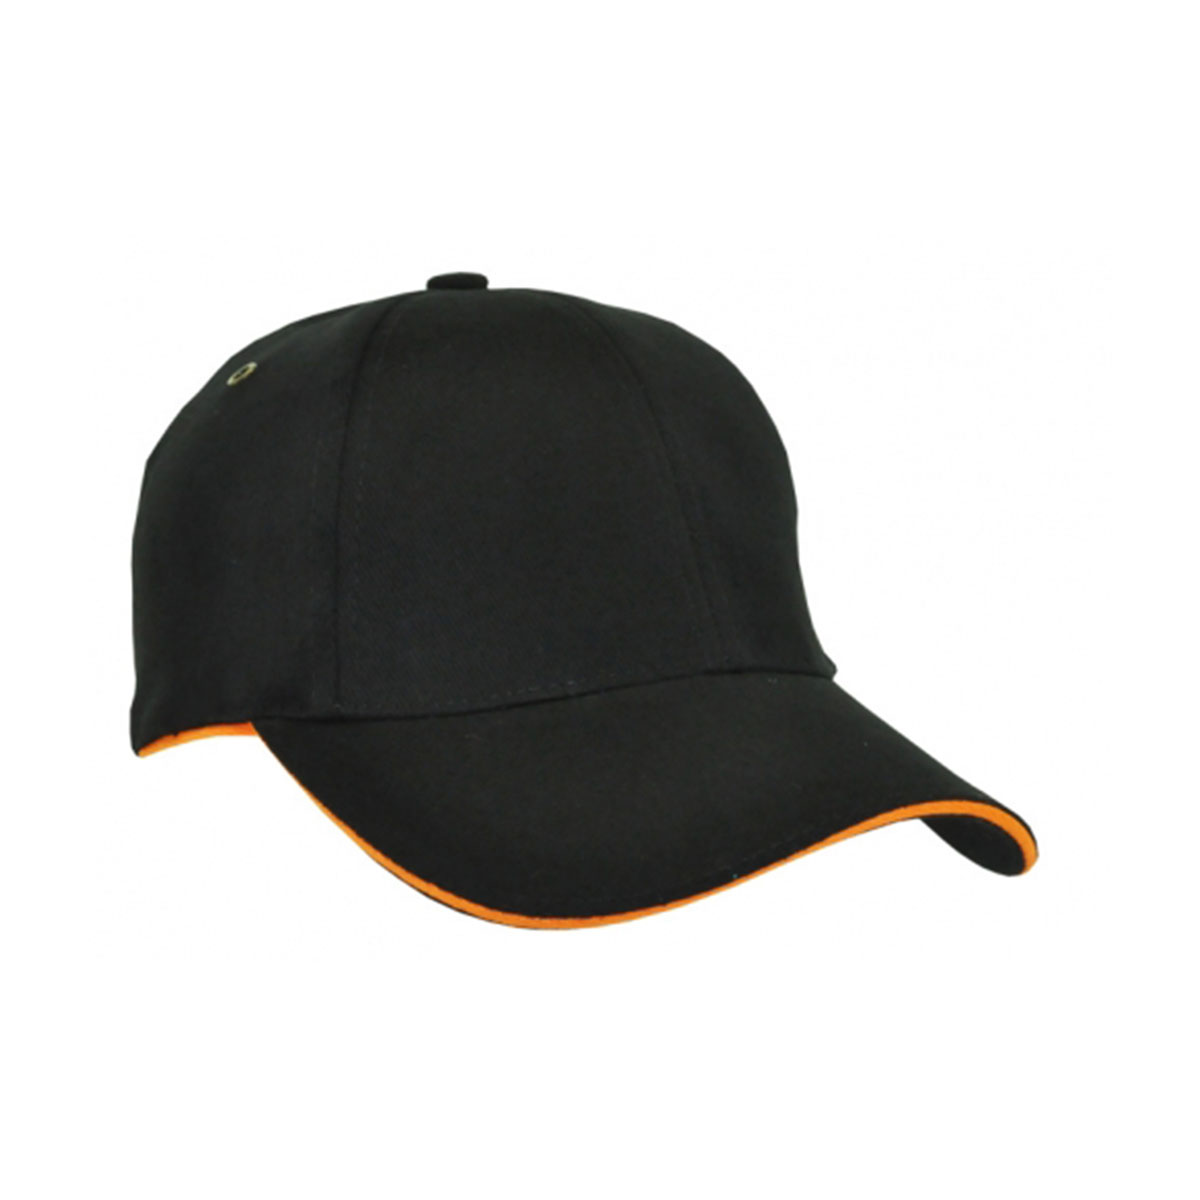 HBC Sandwich Surround Cap-Black / Orange